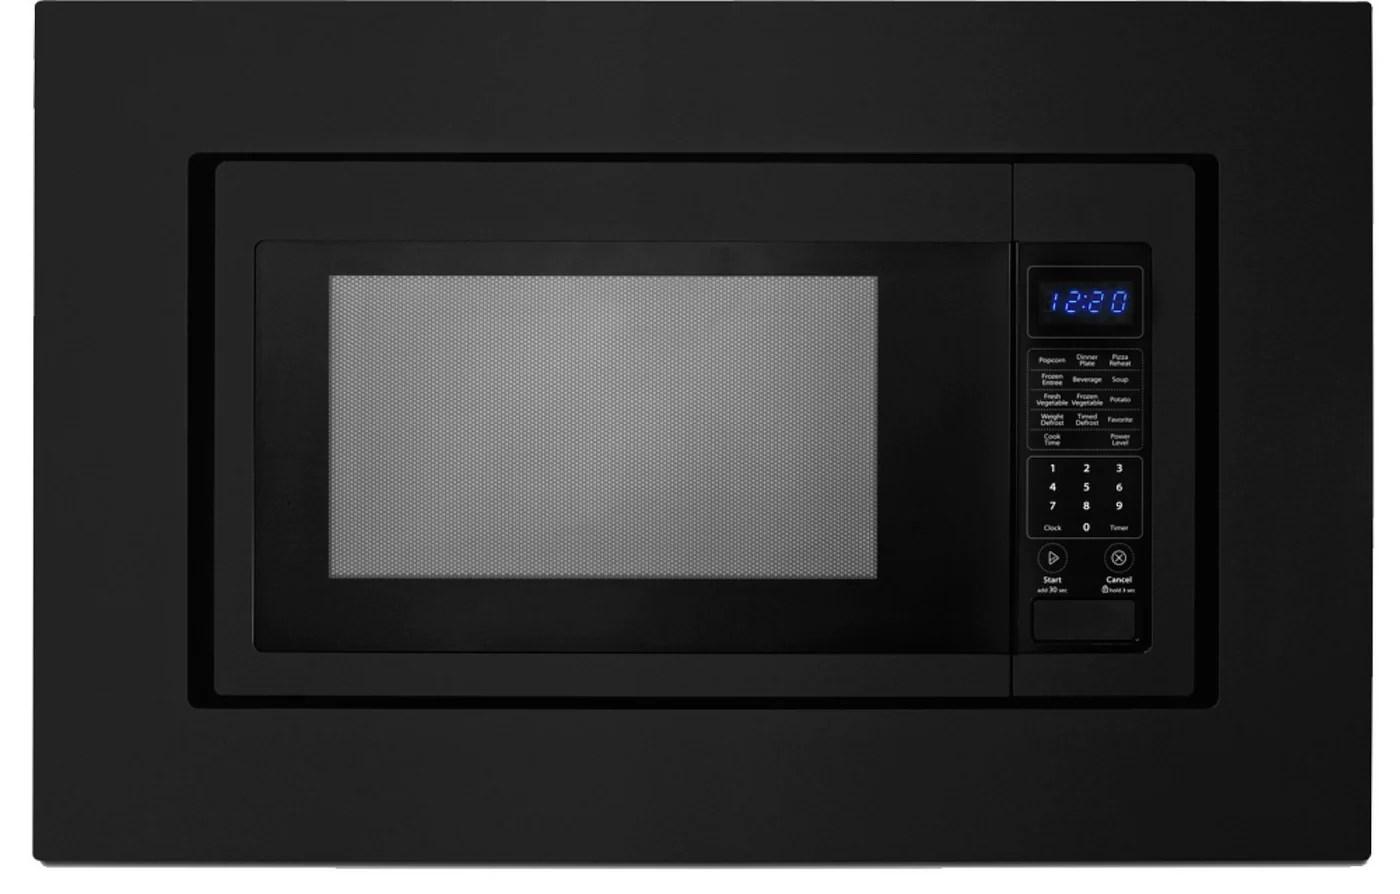 unbranded black countertop microwave trim kit 27 inch mk2167ab